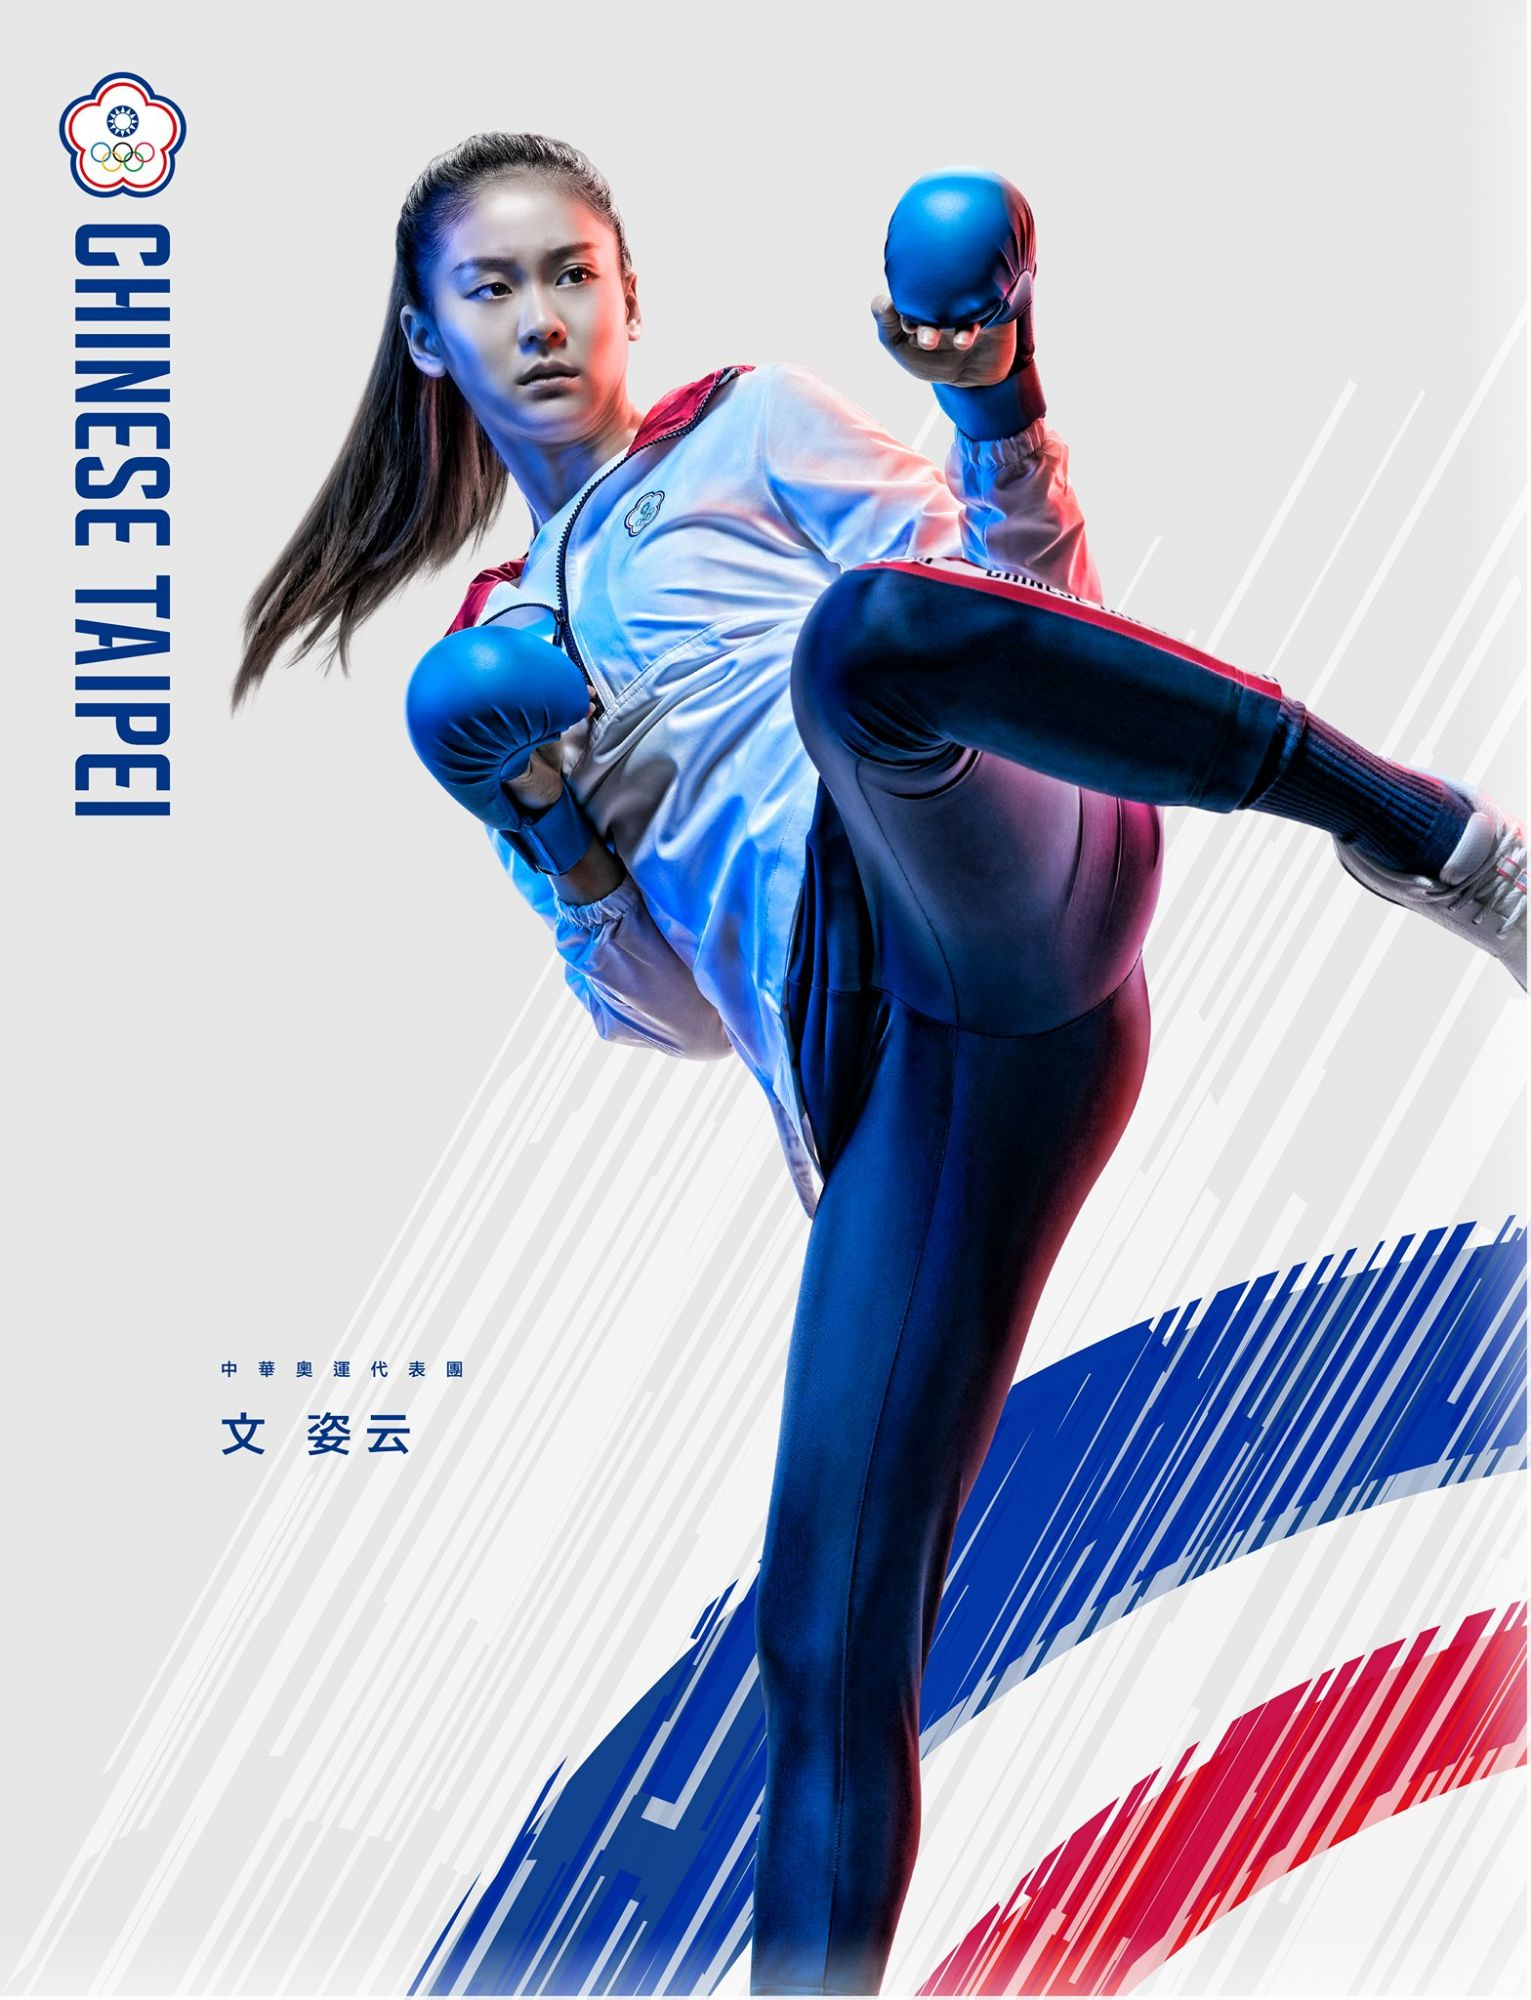 文姿云。(圖片來源/中華奧會 Chinese Taipei Olympic Committee@Facebook)